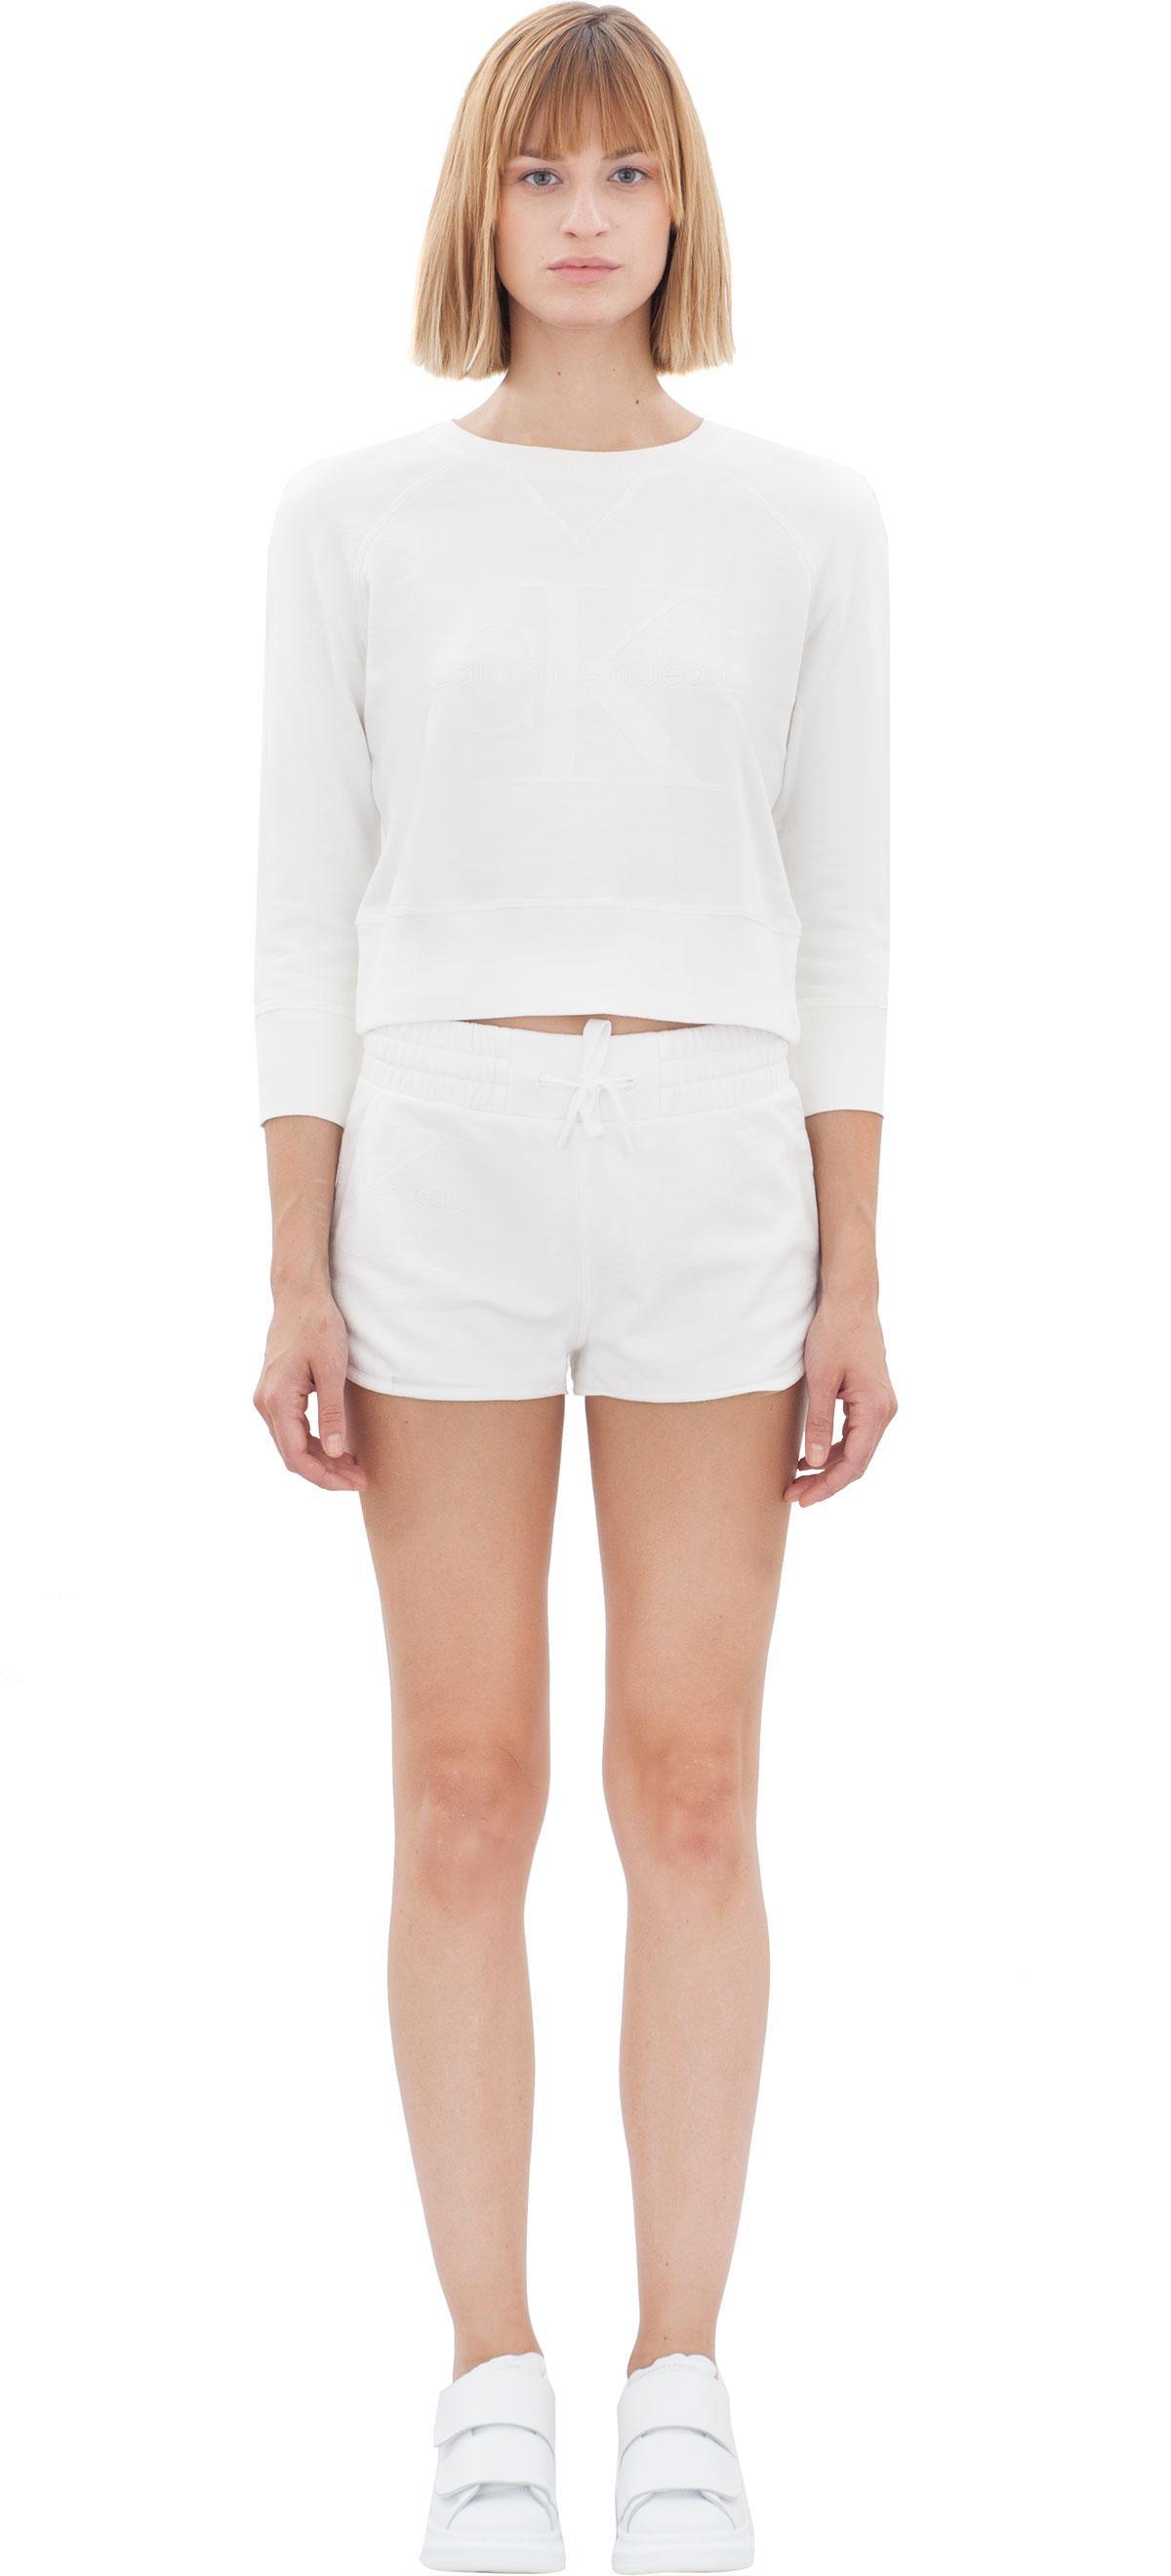 calvin klein jeans 3 4 sleeve sweatshirt in white lyst. Black Bedroom Furniture Sets. Home Design Ideas